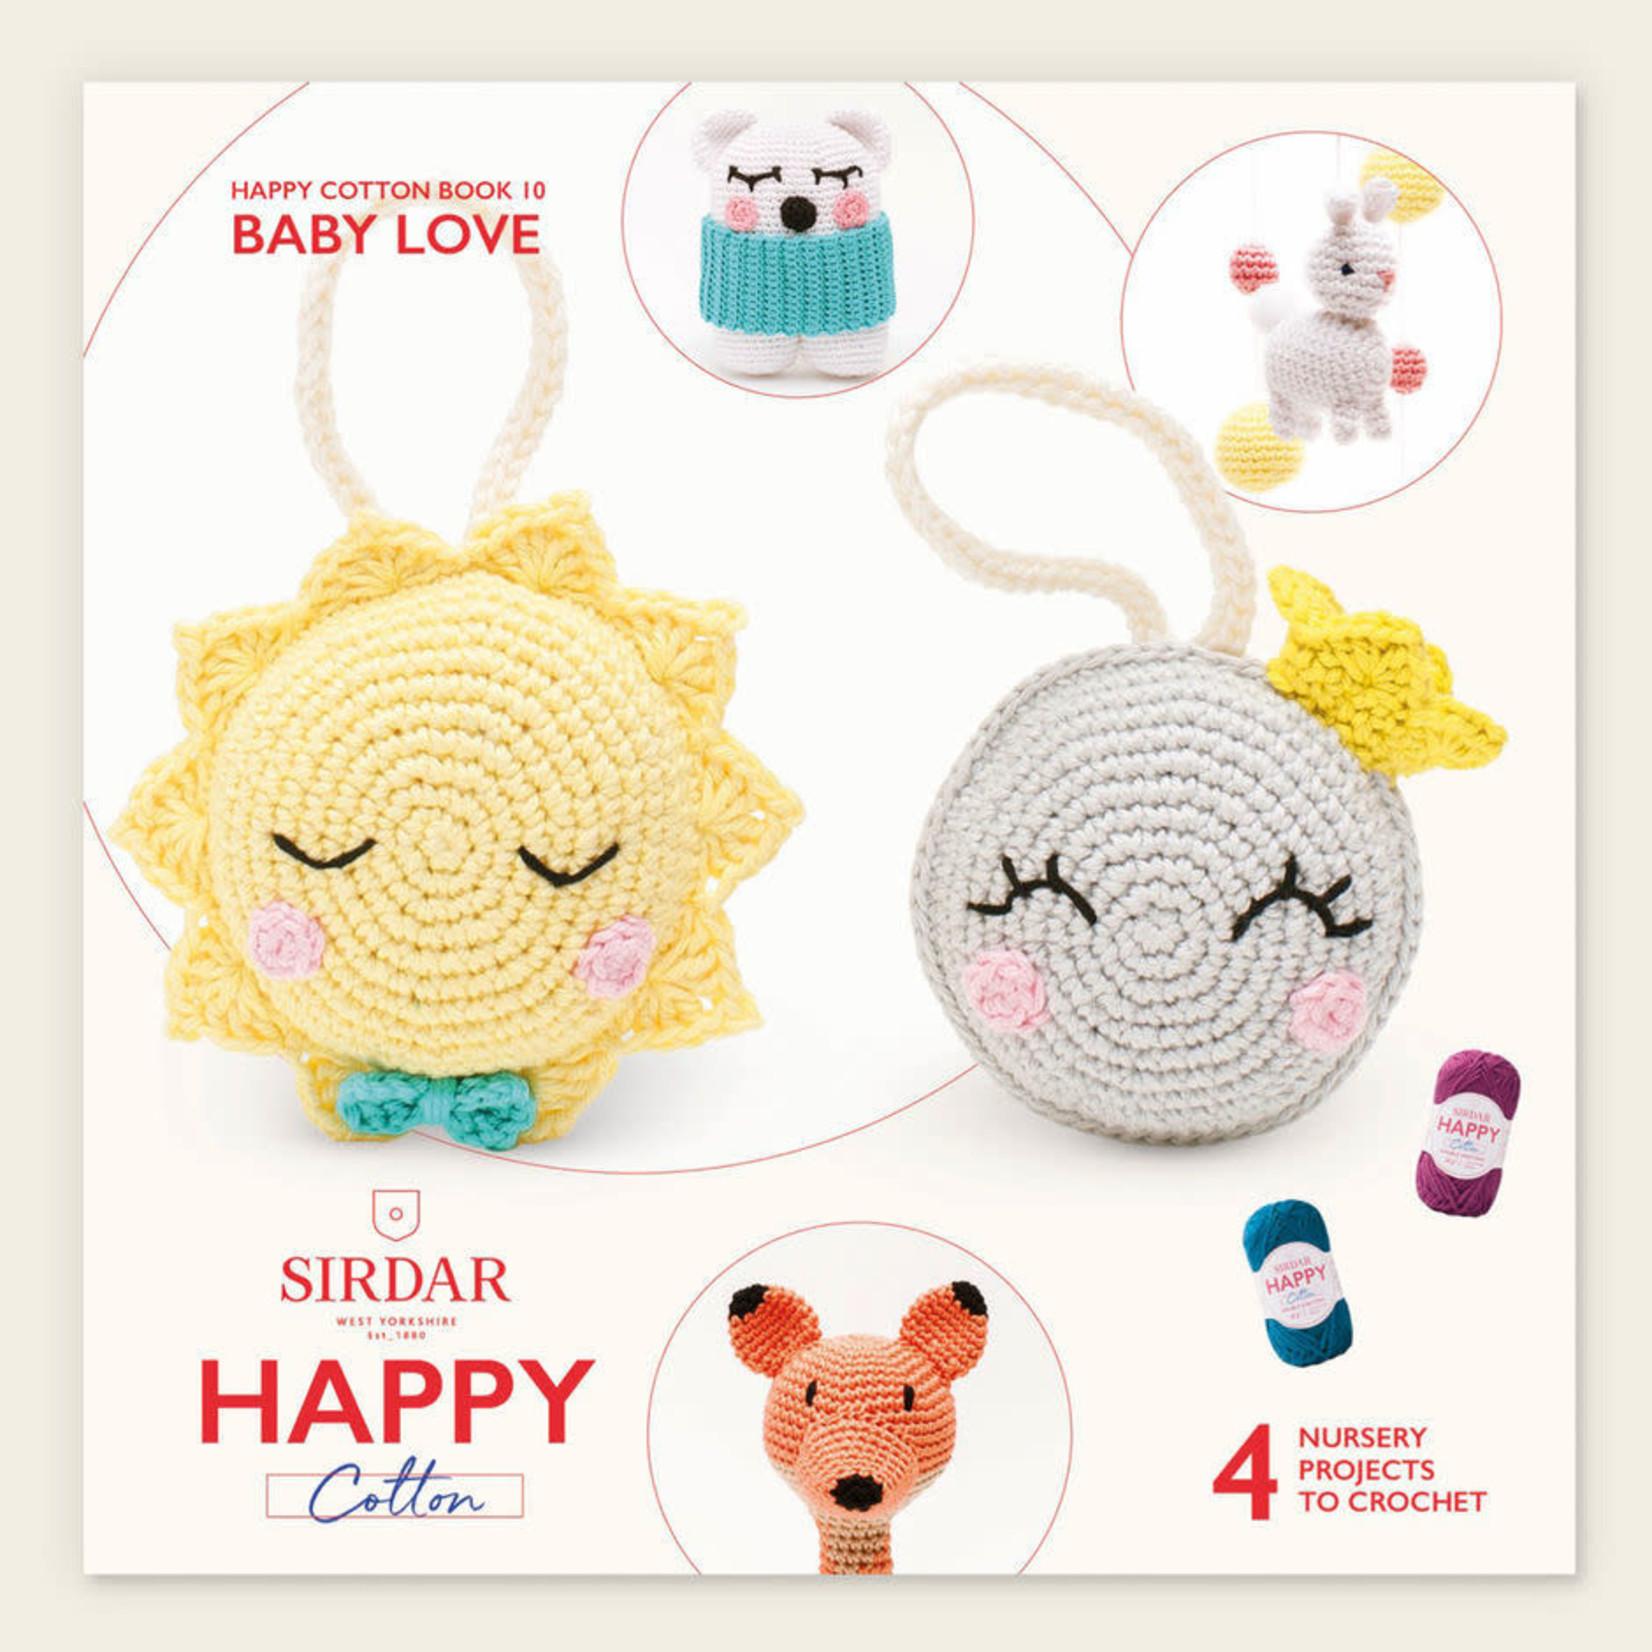 Sirdar Happy Cotton Book